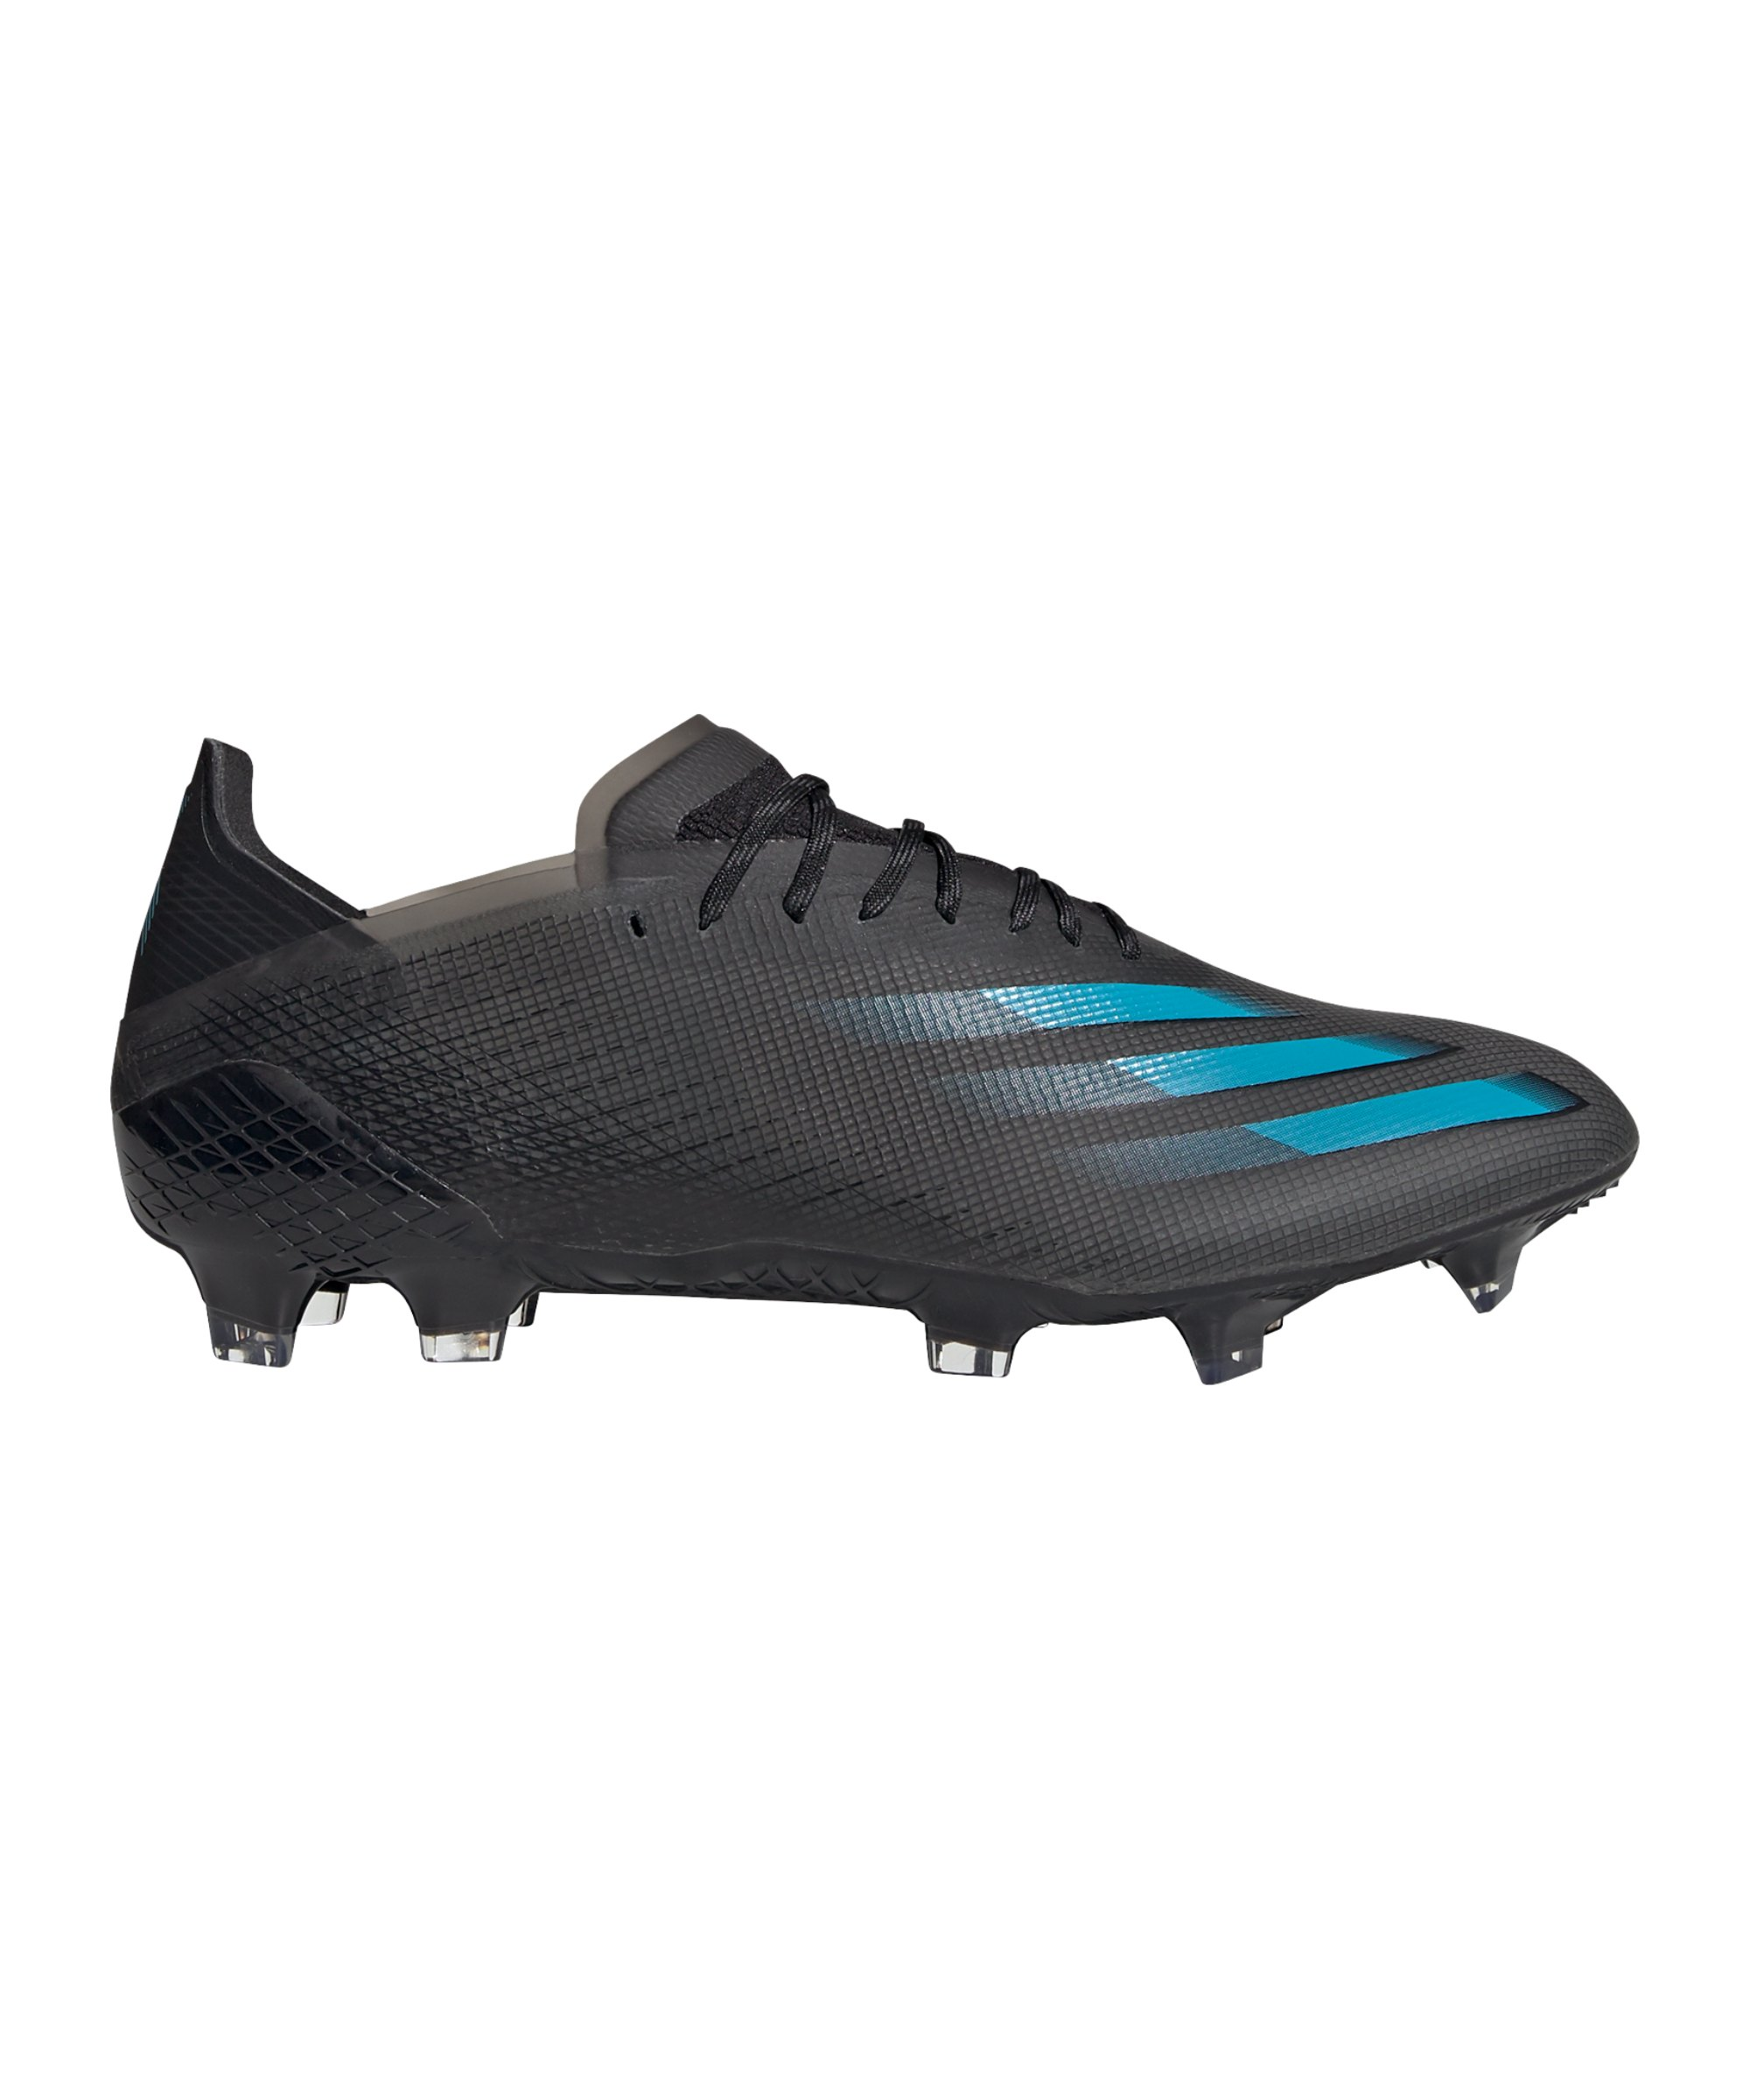 adidas X GHOSTED.1 FG Dark Motion Schwarz Blau - schwarz